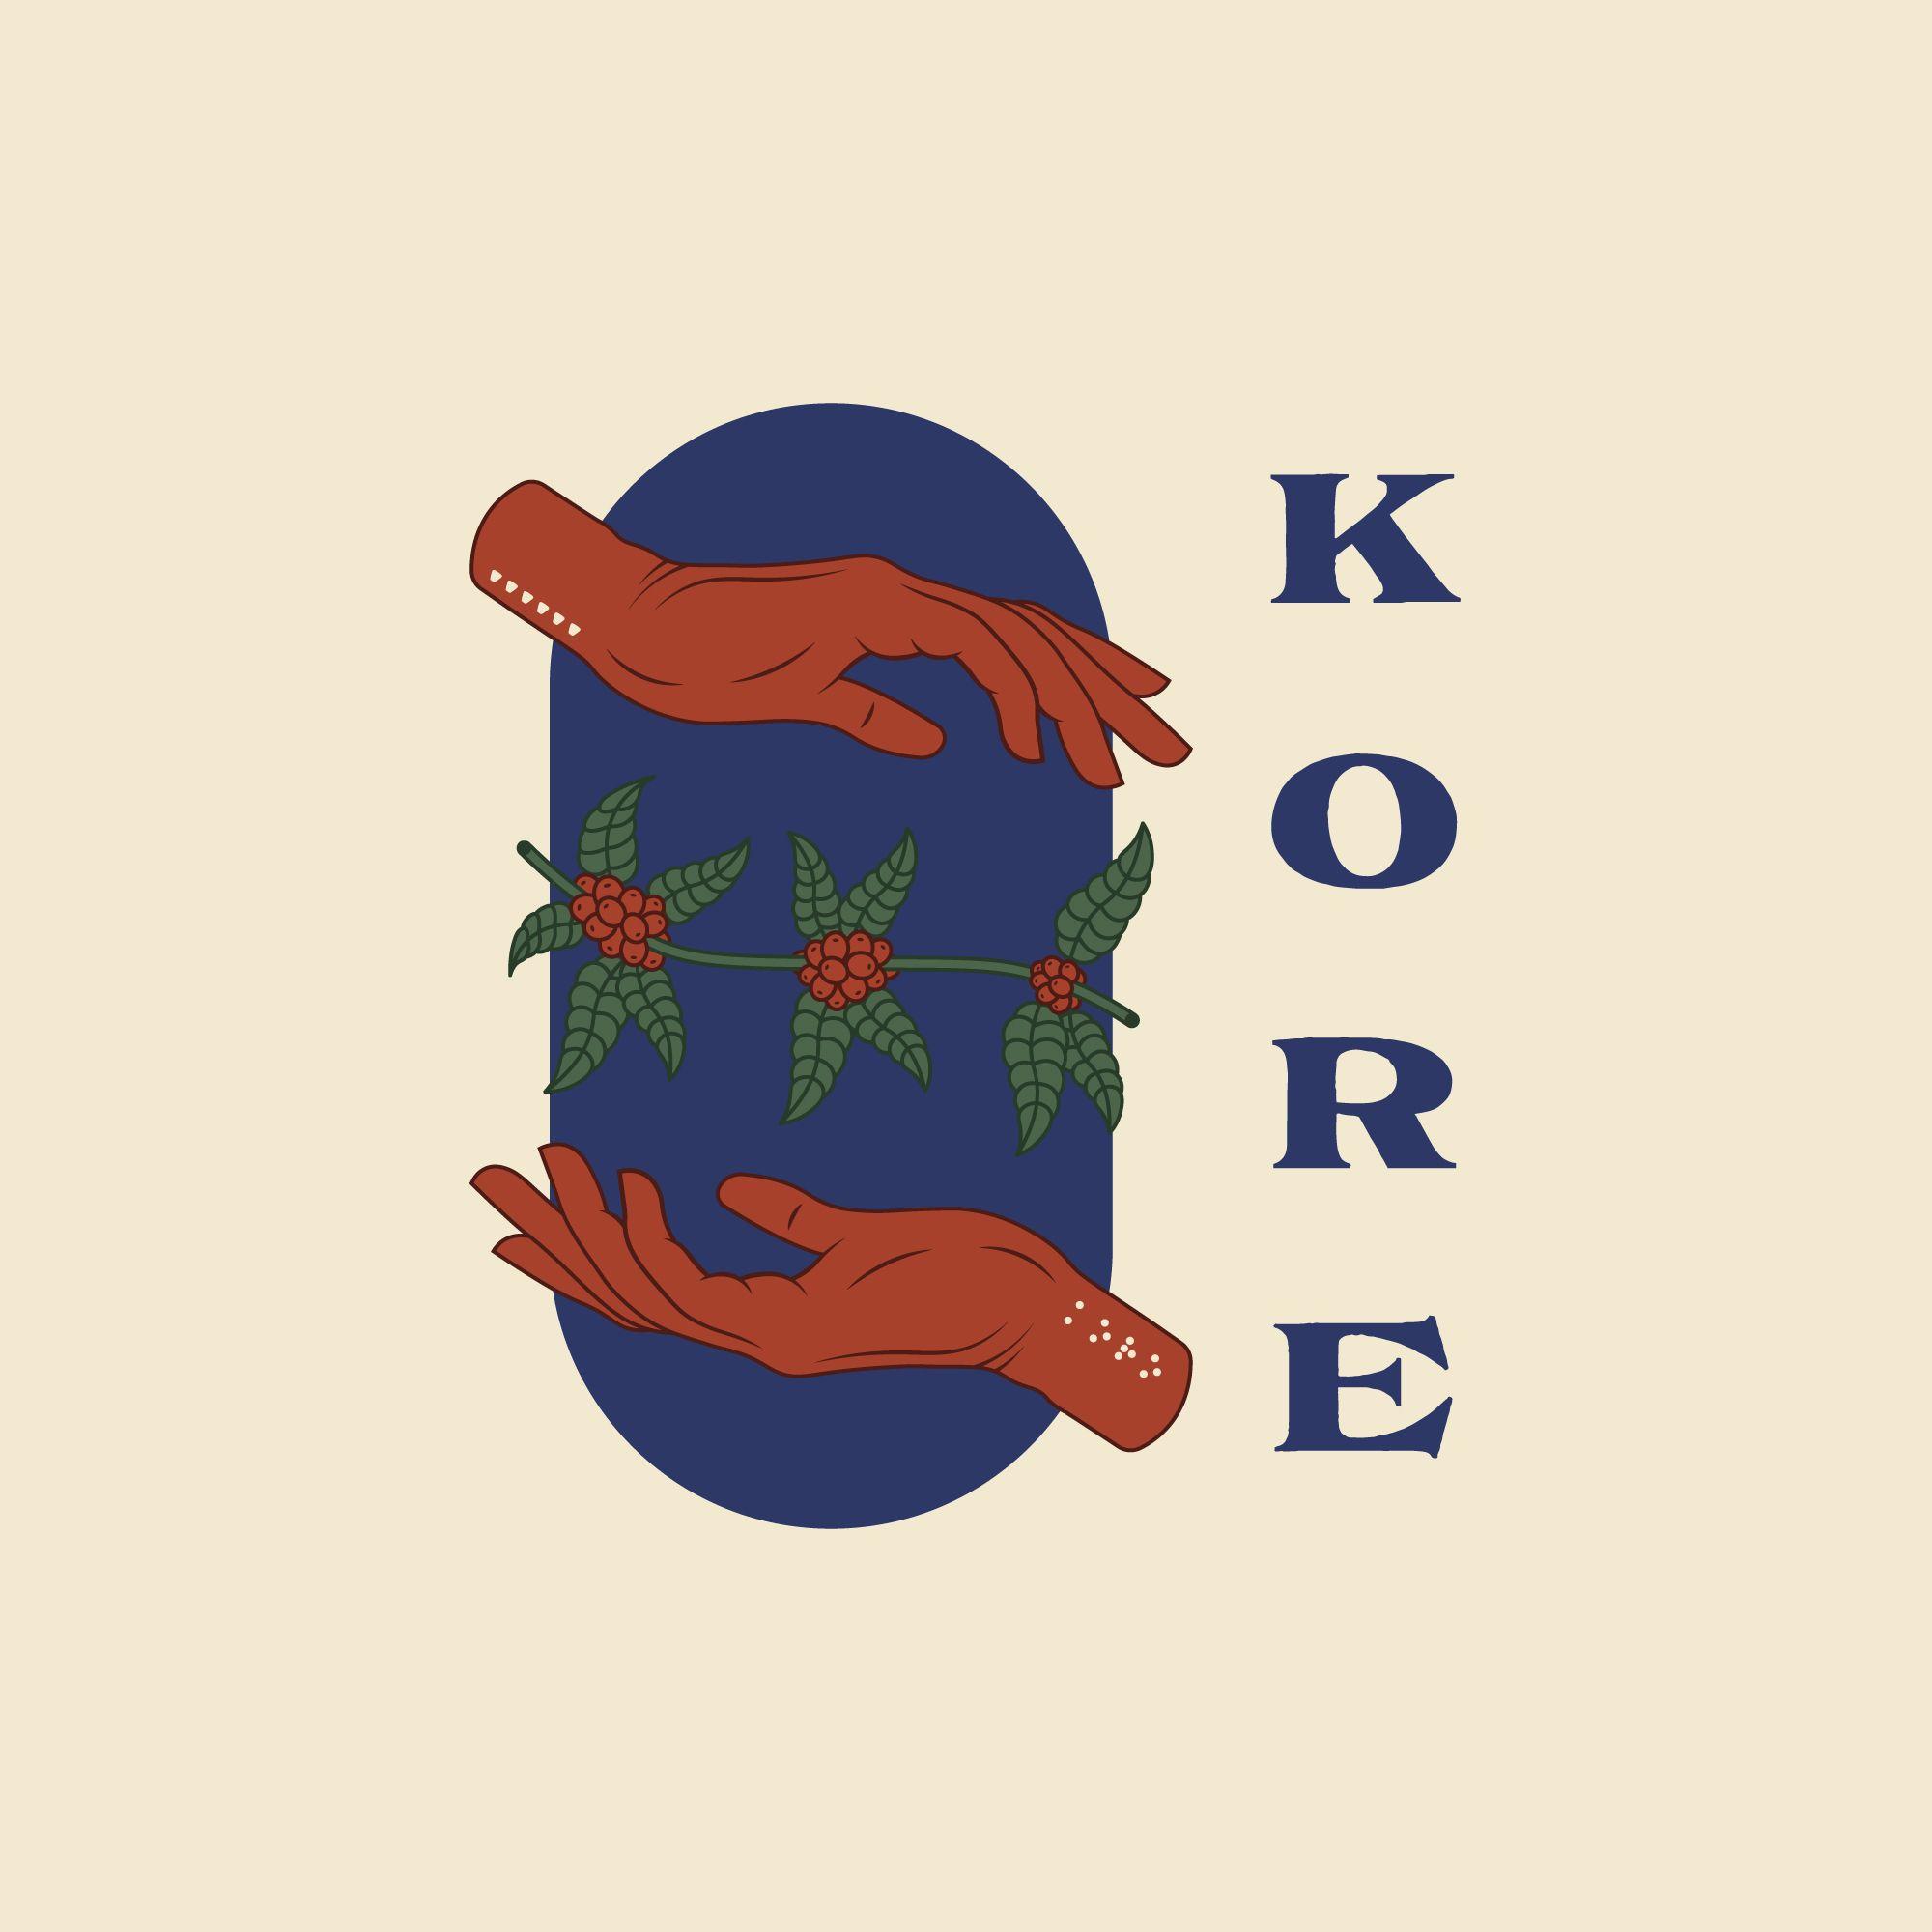 Kore Directive